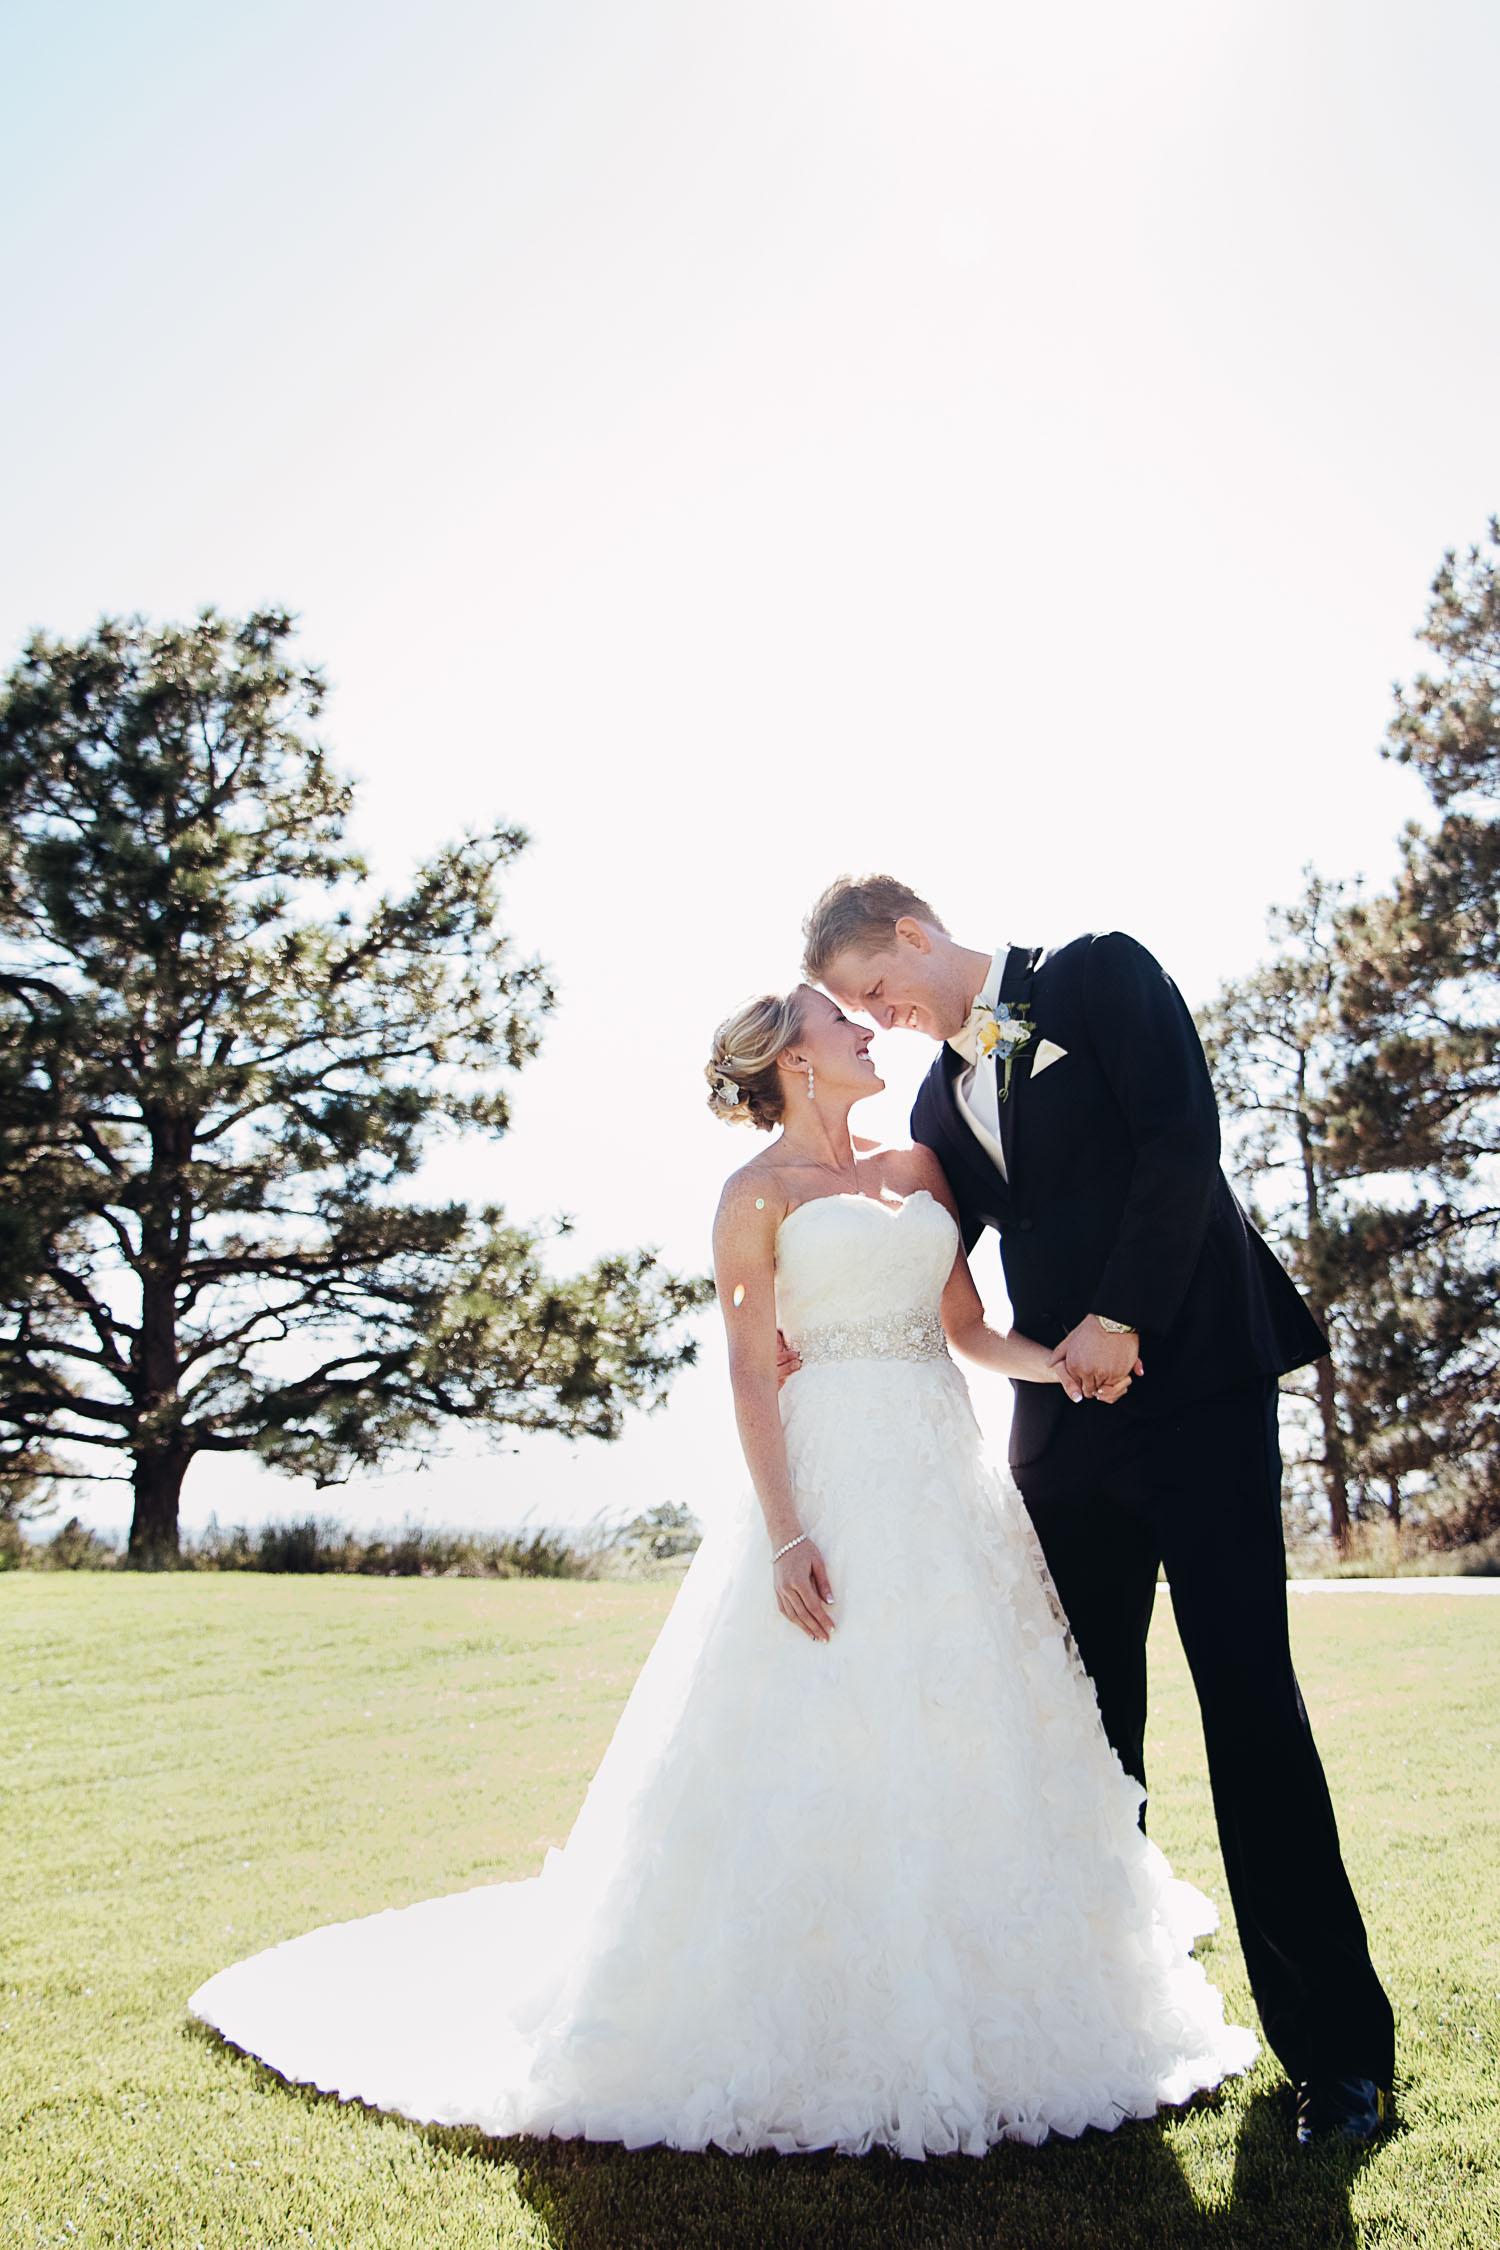 JMPHOTOART-Wedding-Photographer-42.jpg